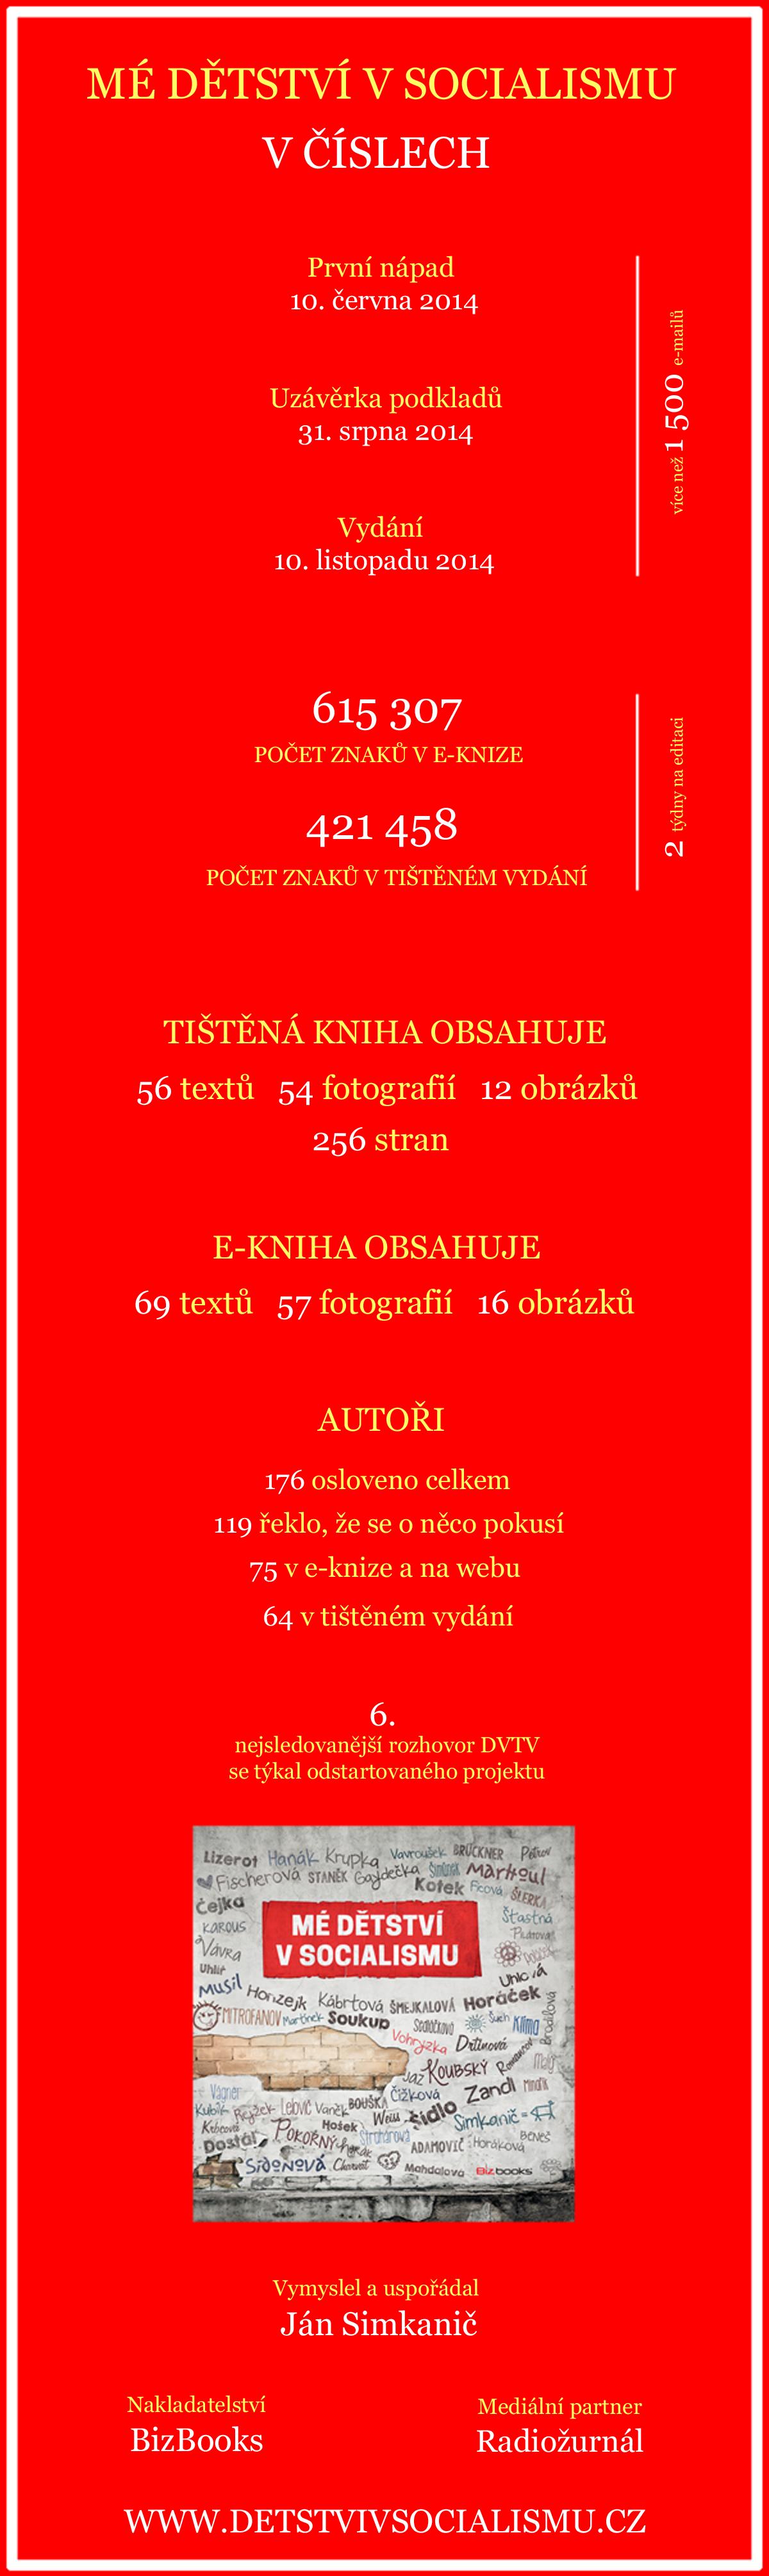 Detstvi - cisla 1200